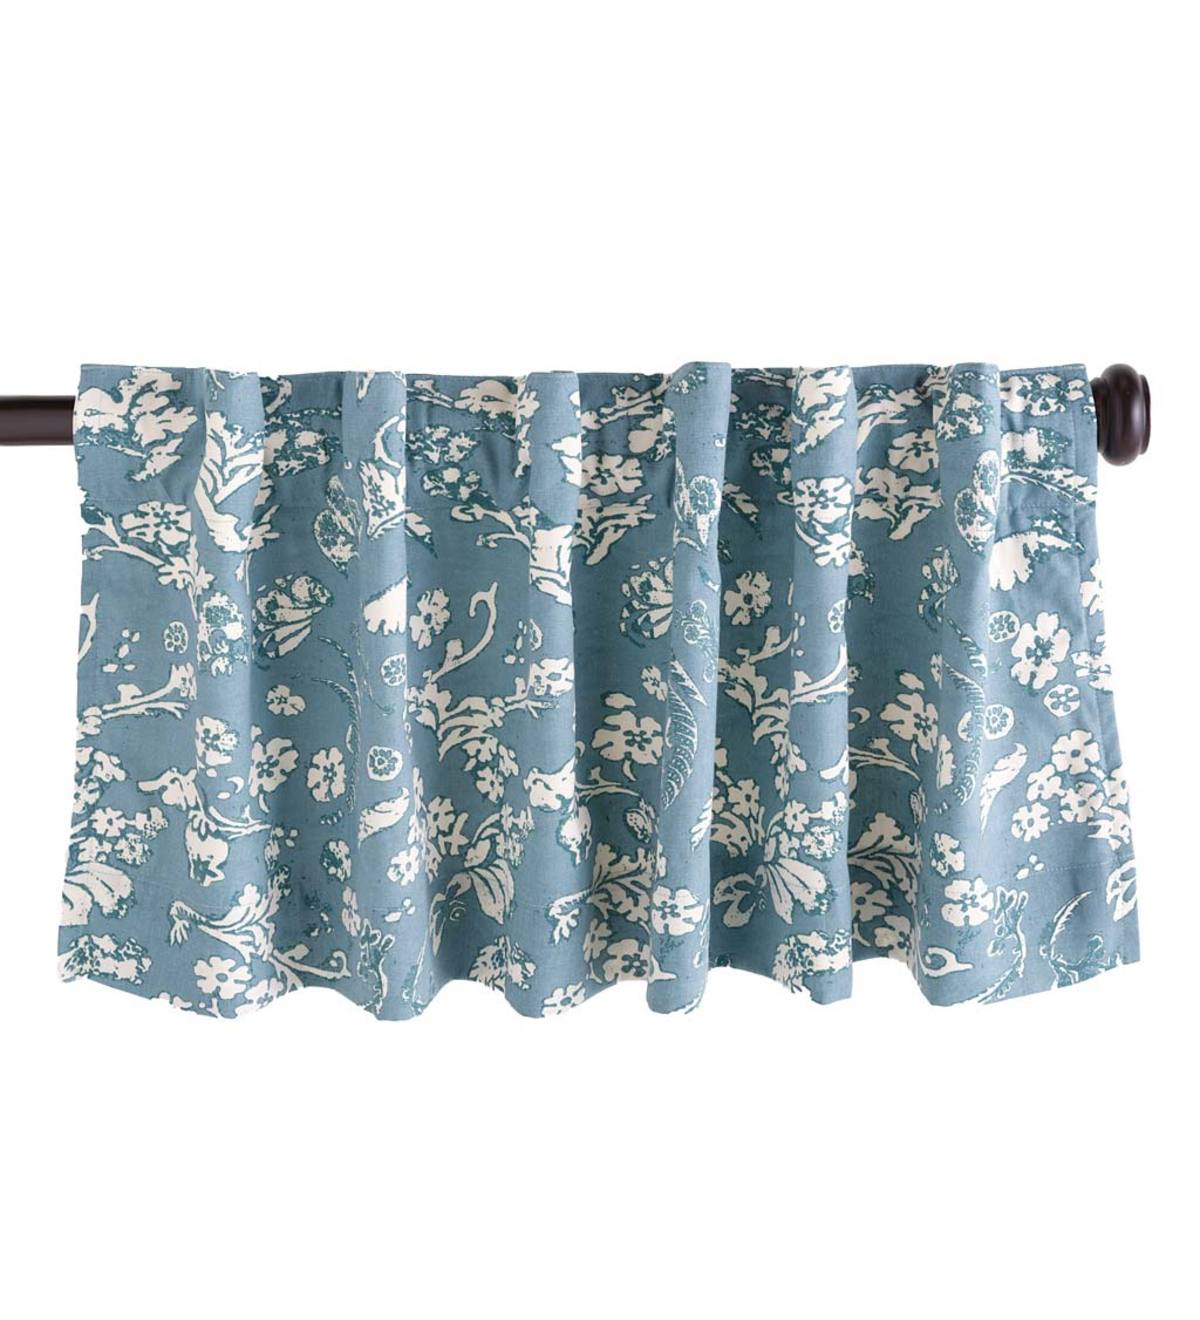 Floral Damask Rod Pocket Homespun Insulated Curtain Valance 42 W X 14 L Blue Plowhearth